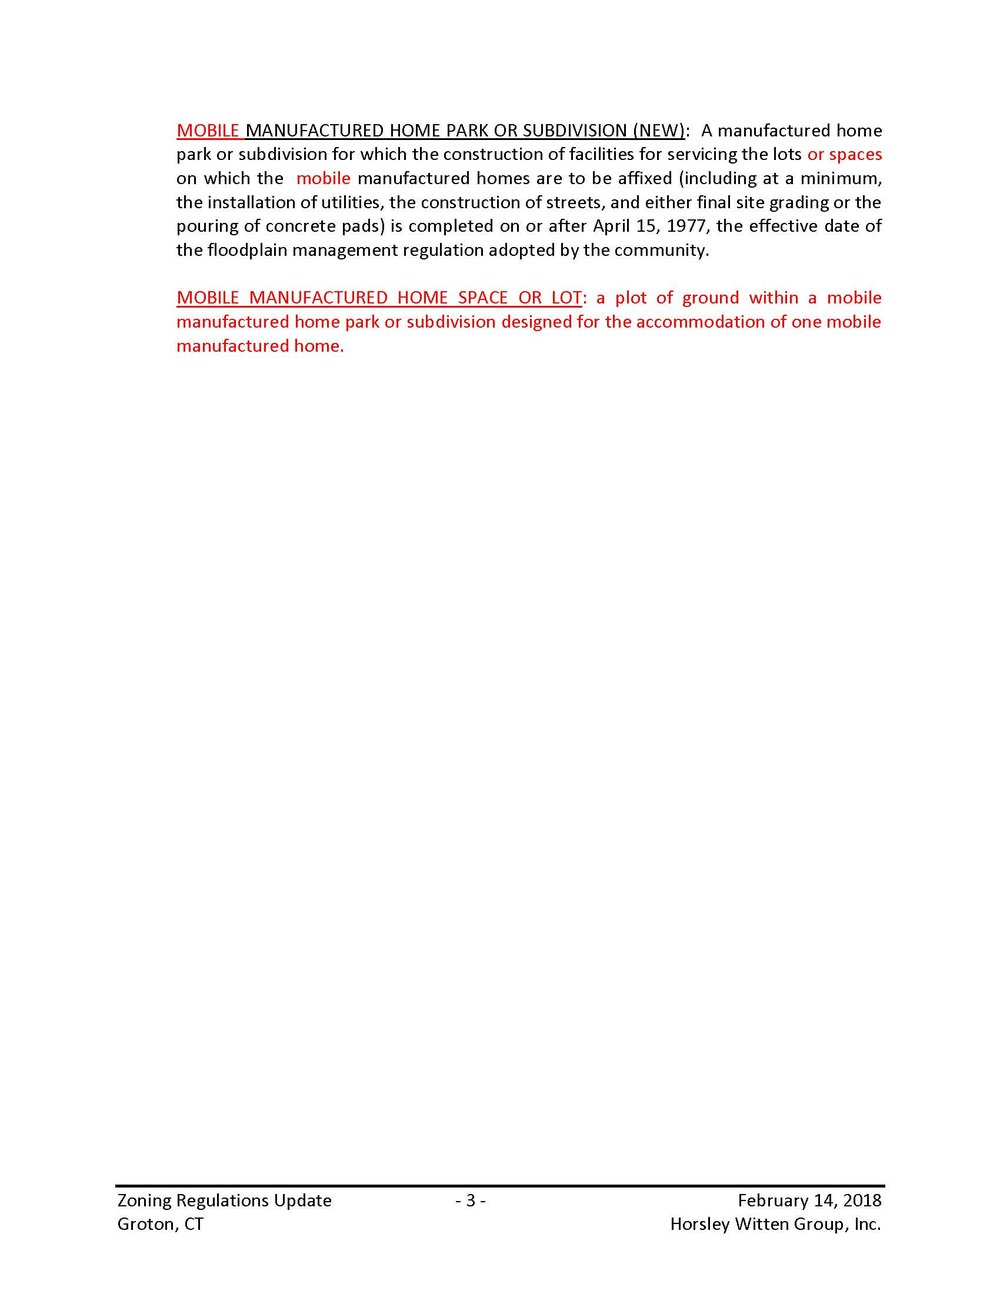 180228_ZCMtg_Memo_16156_Page_3.jpg